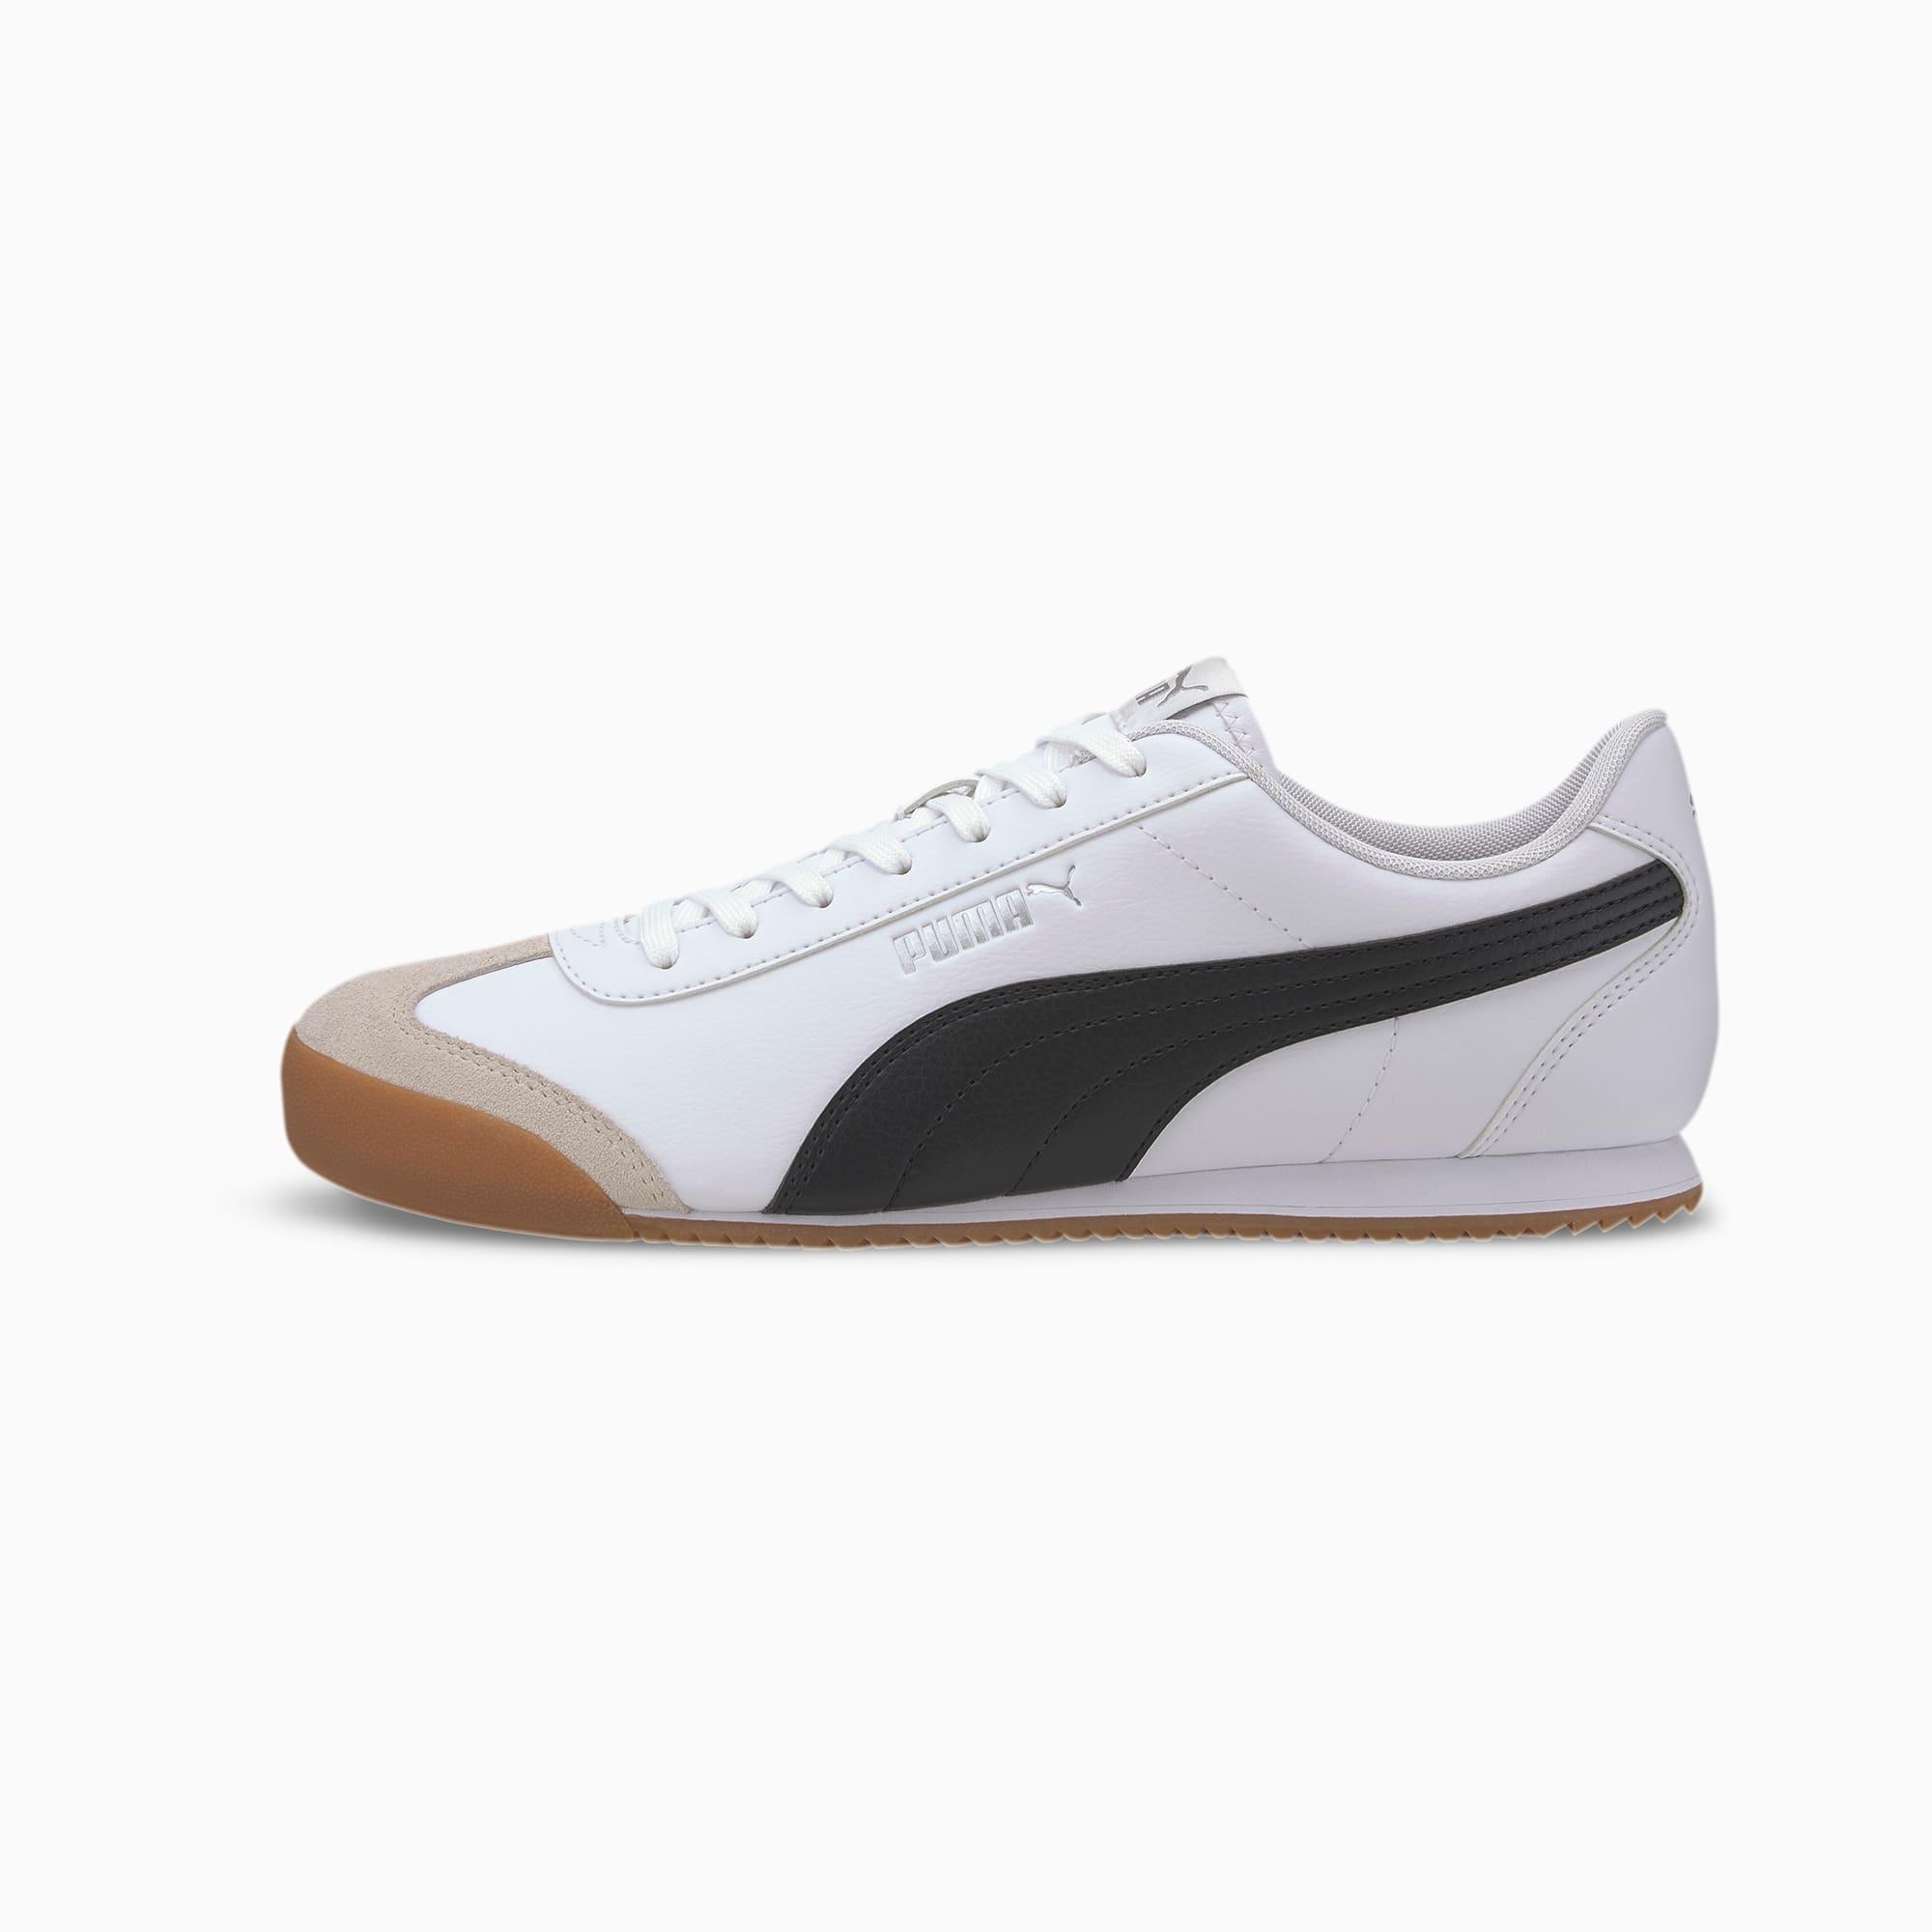 PUMA Turino Men's Sneakers